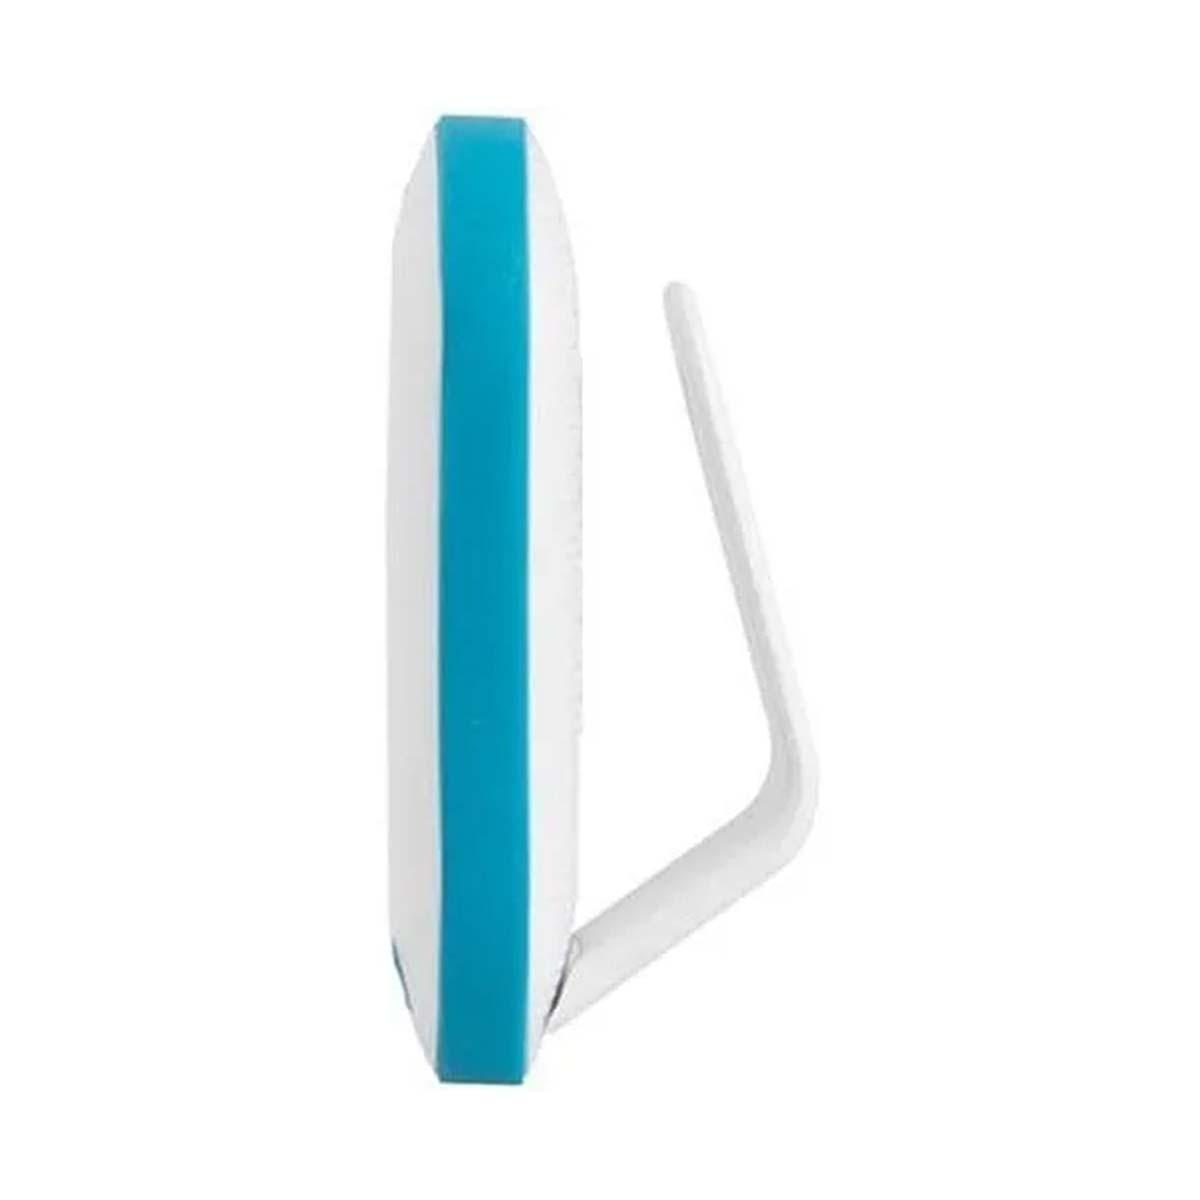 Kit 04 Controle Remoto Intelbras 433mhz Xac 4000 Smart Azul